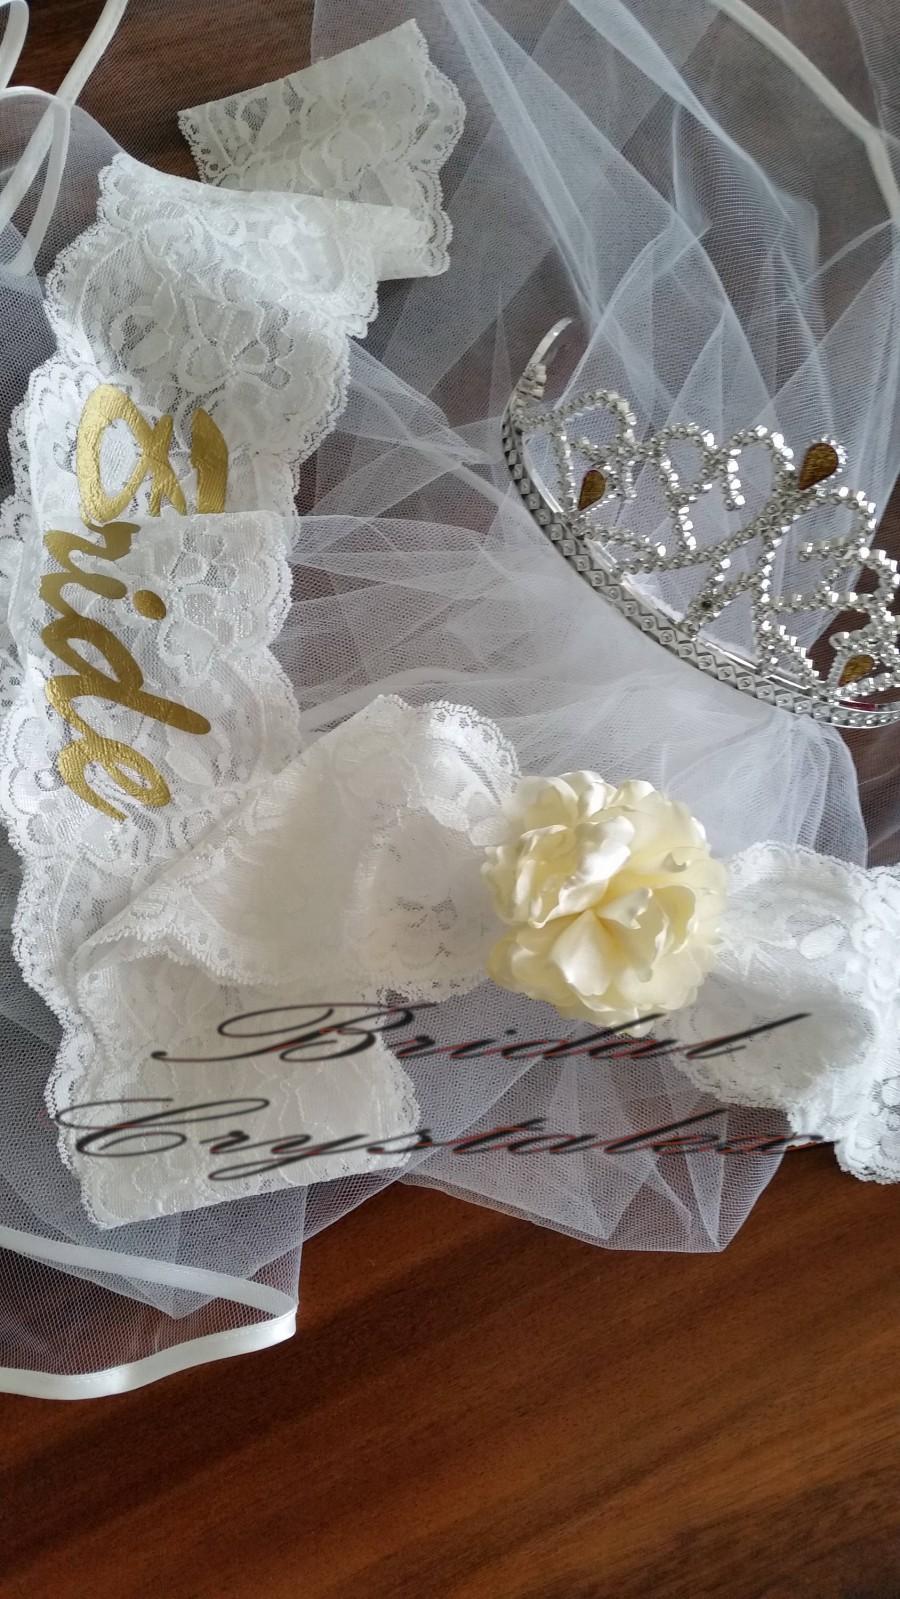 Hochzeit - Bachelorette Party Wedding Veil and White & Gold Bride Sash